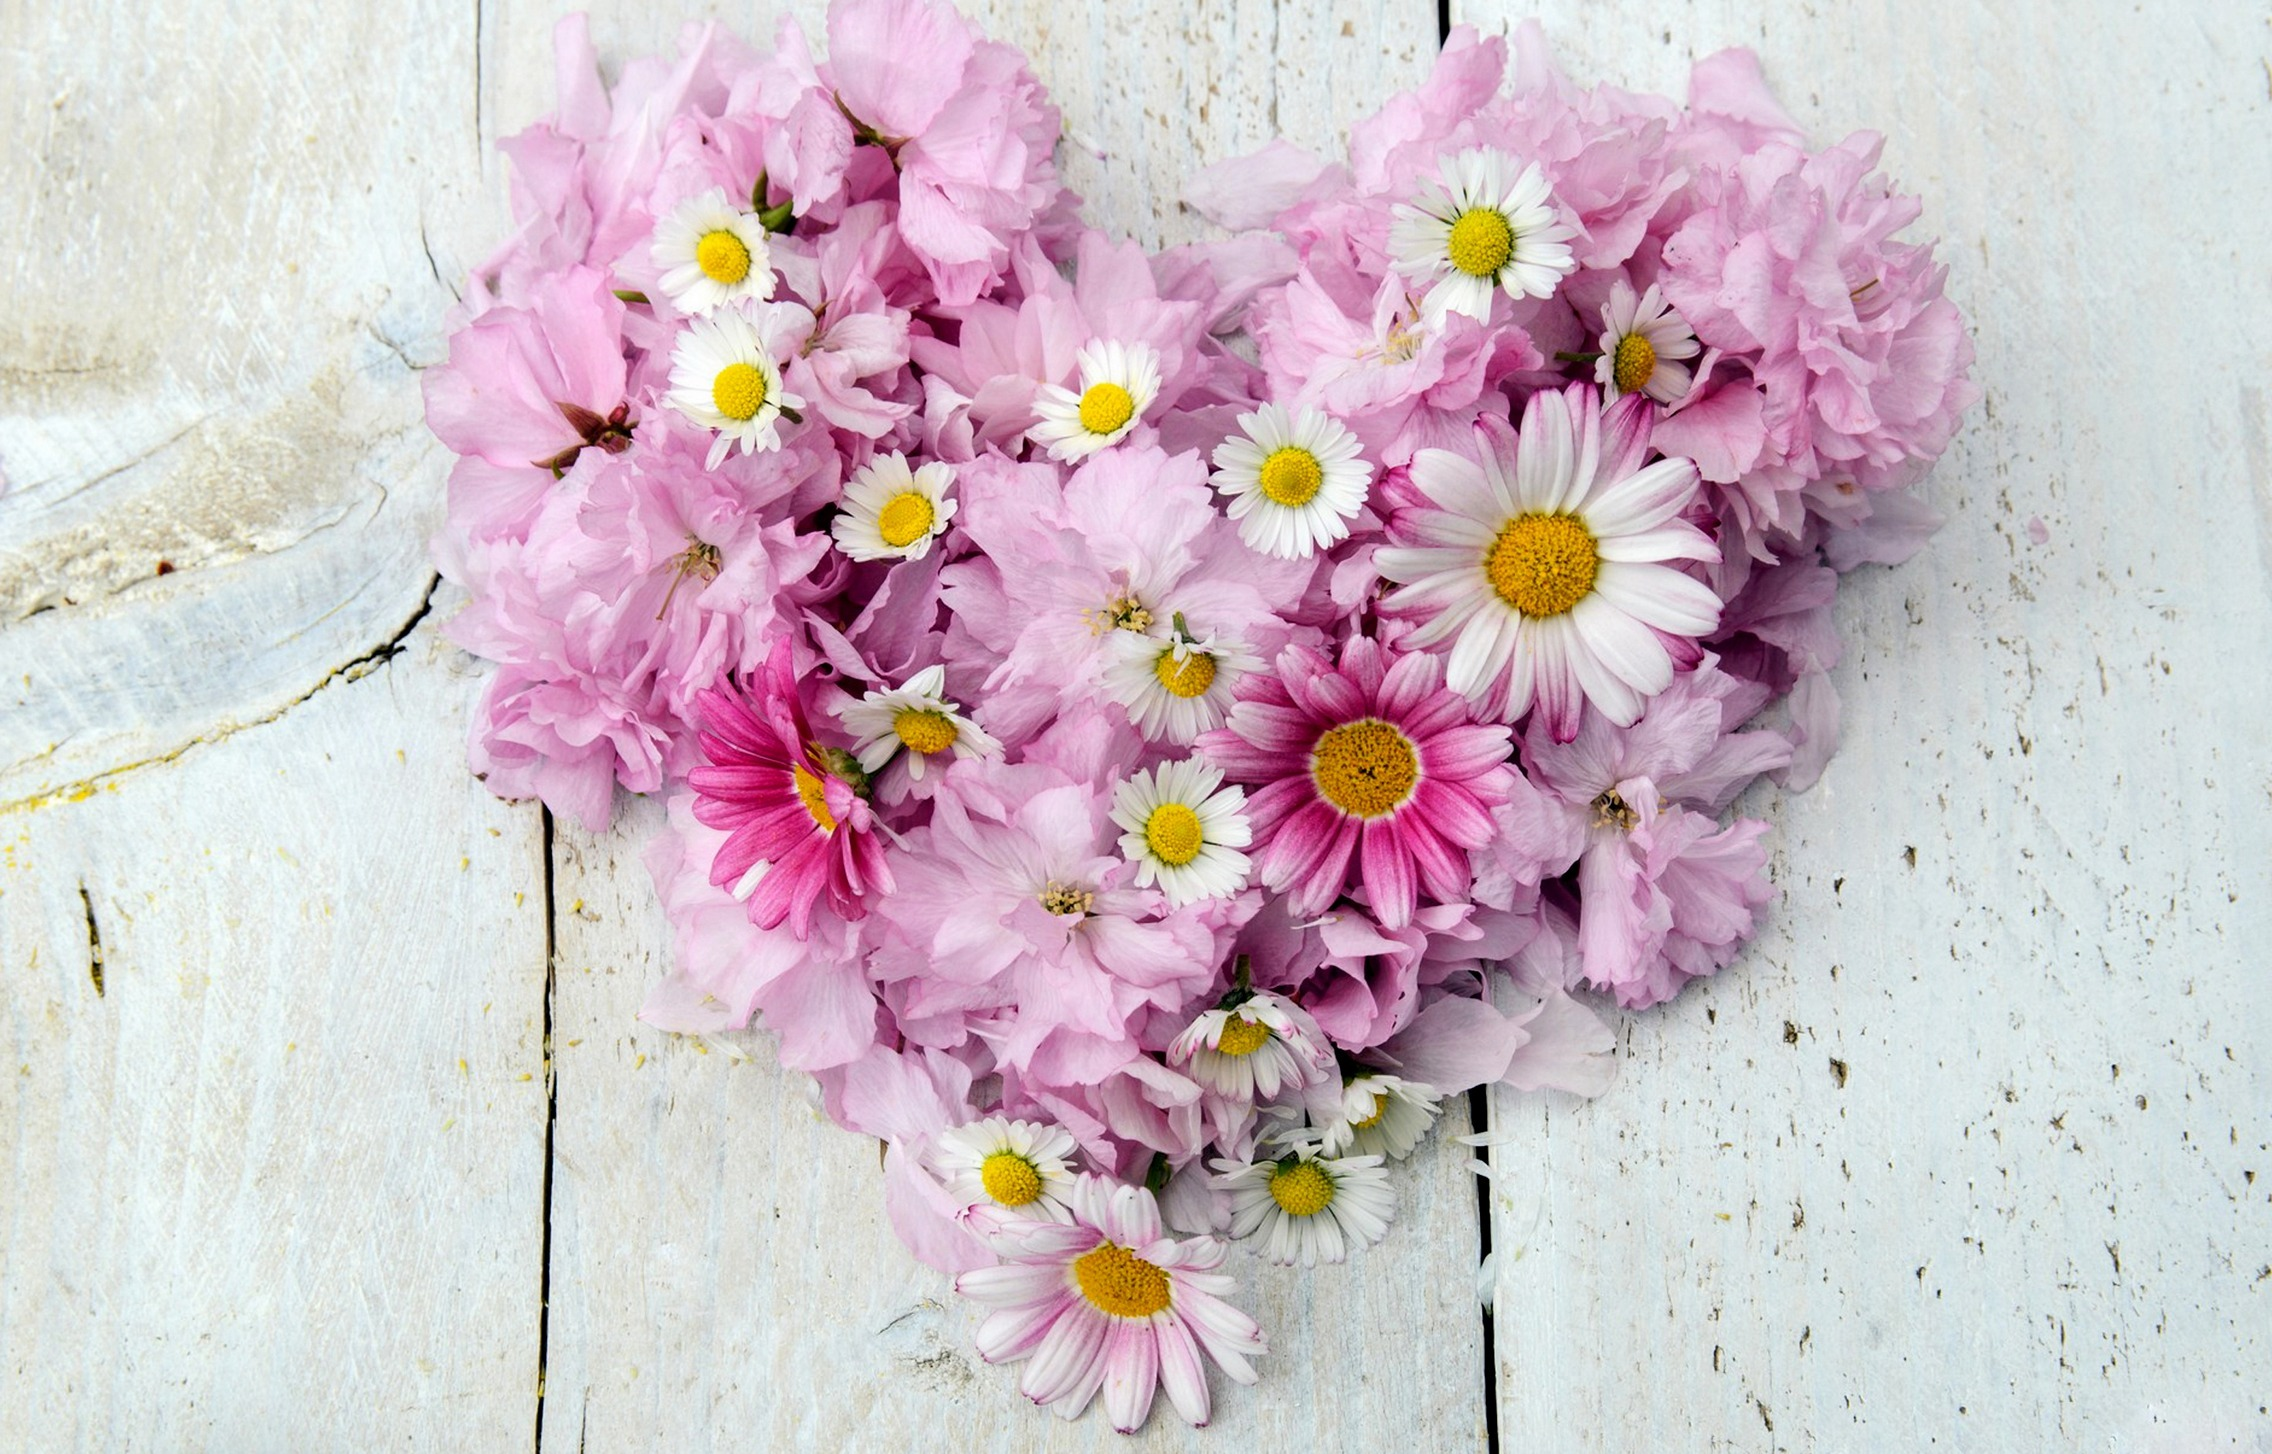 ромашки розовые белые chamomile pink white  № 1037944 без смс